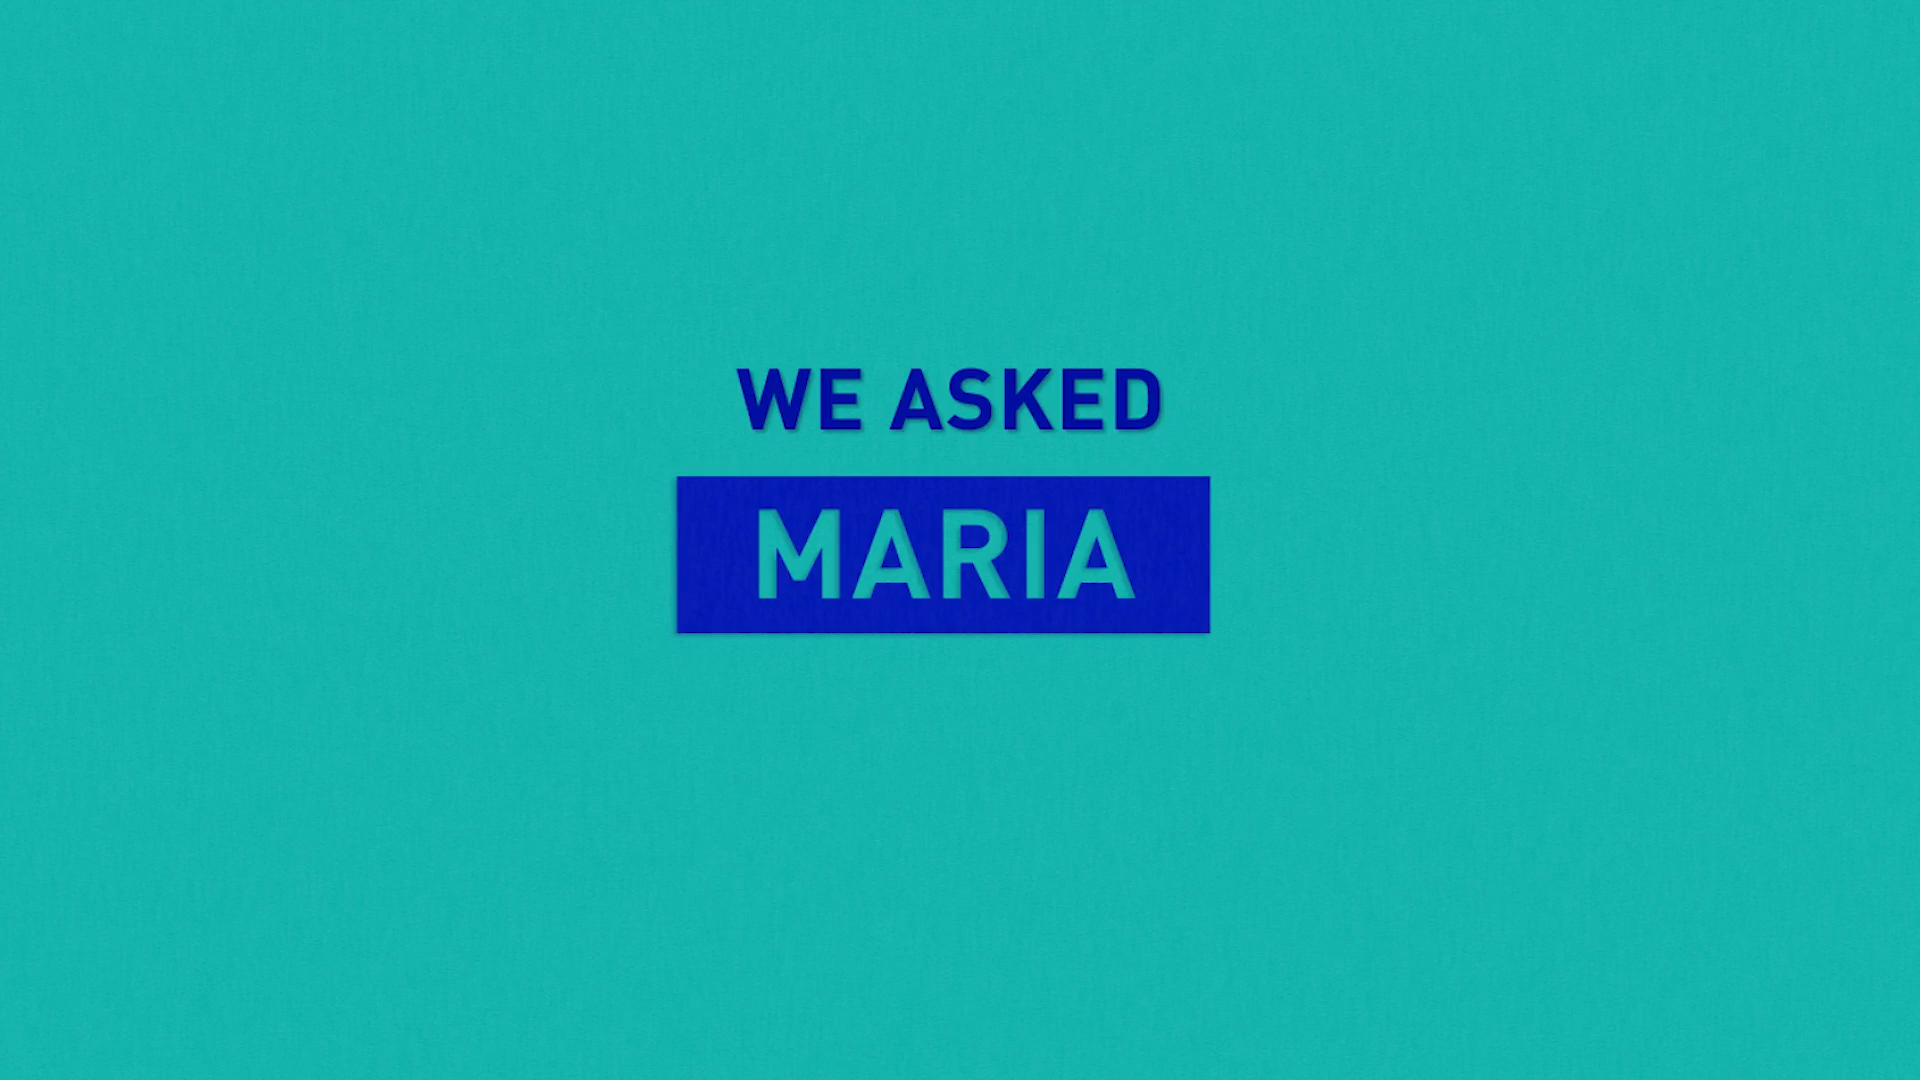 we asked maria splash image